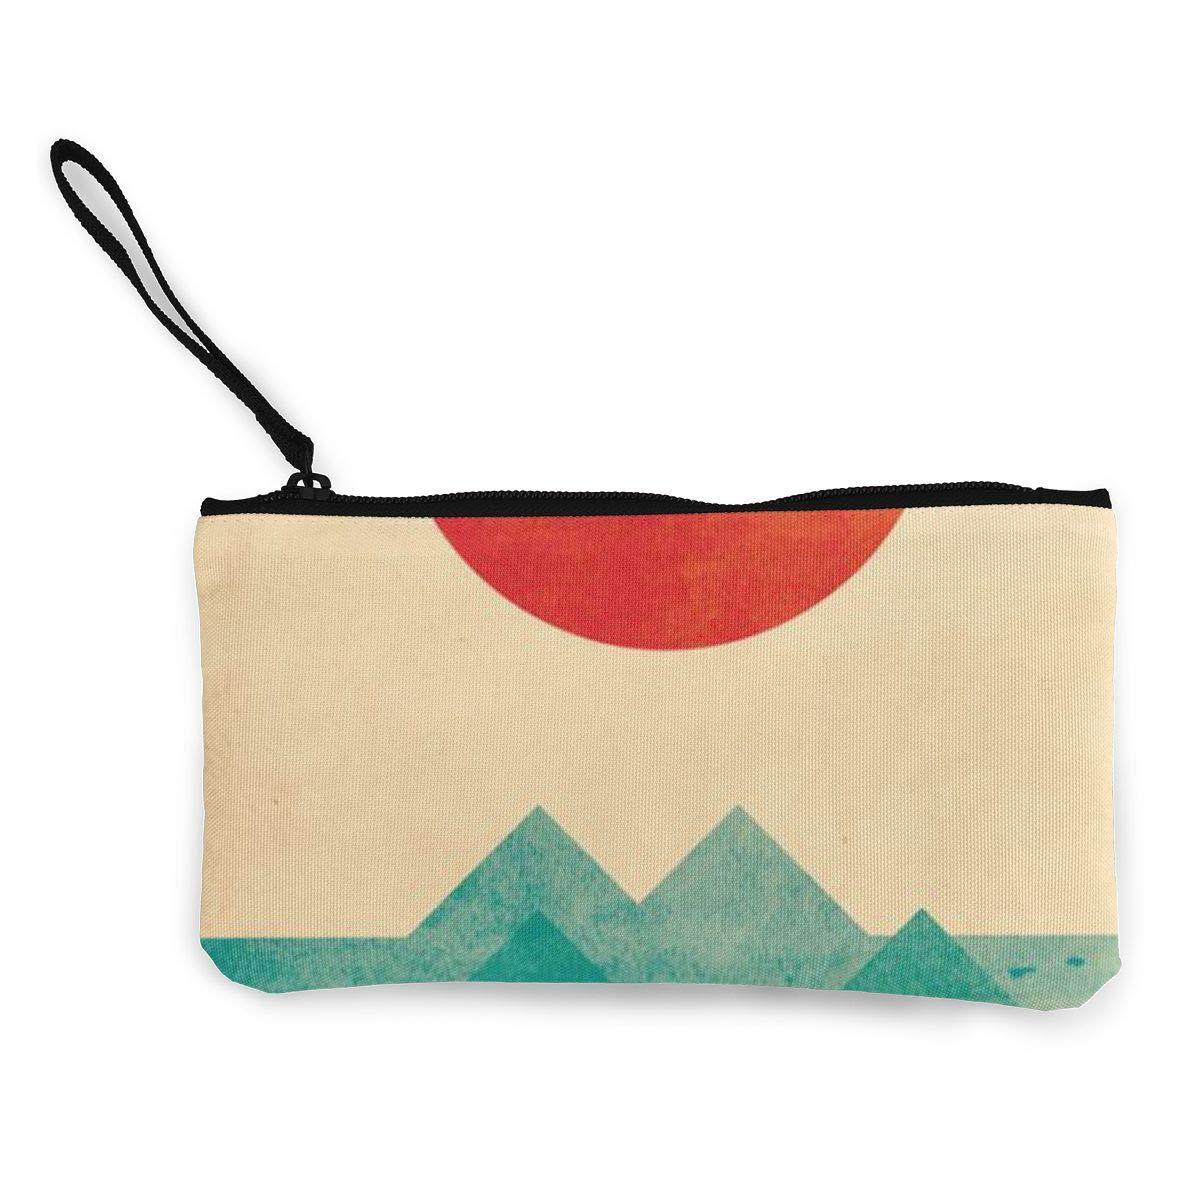 Canvas Cash Coin Purse,The Wave Print Make Up Bag Zipper Small Purse Wallets